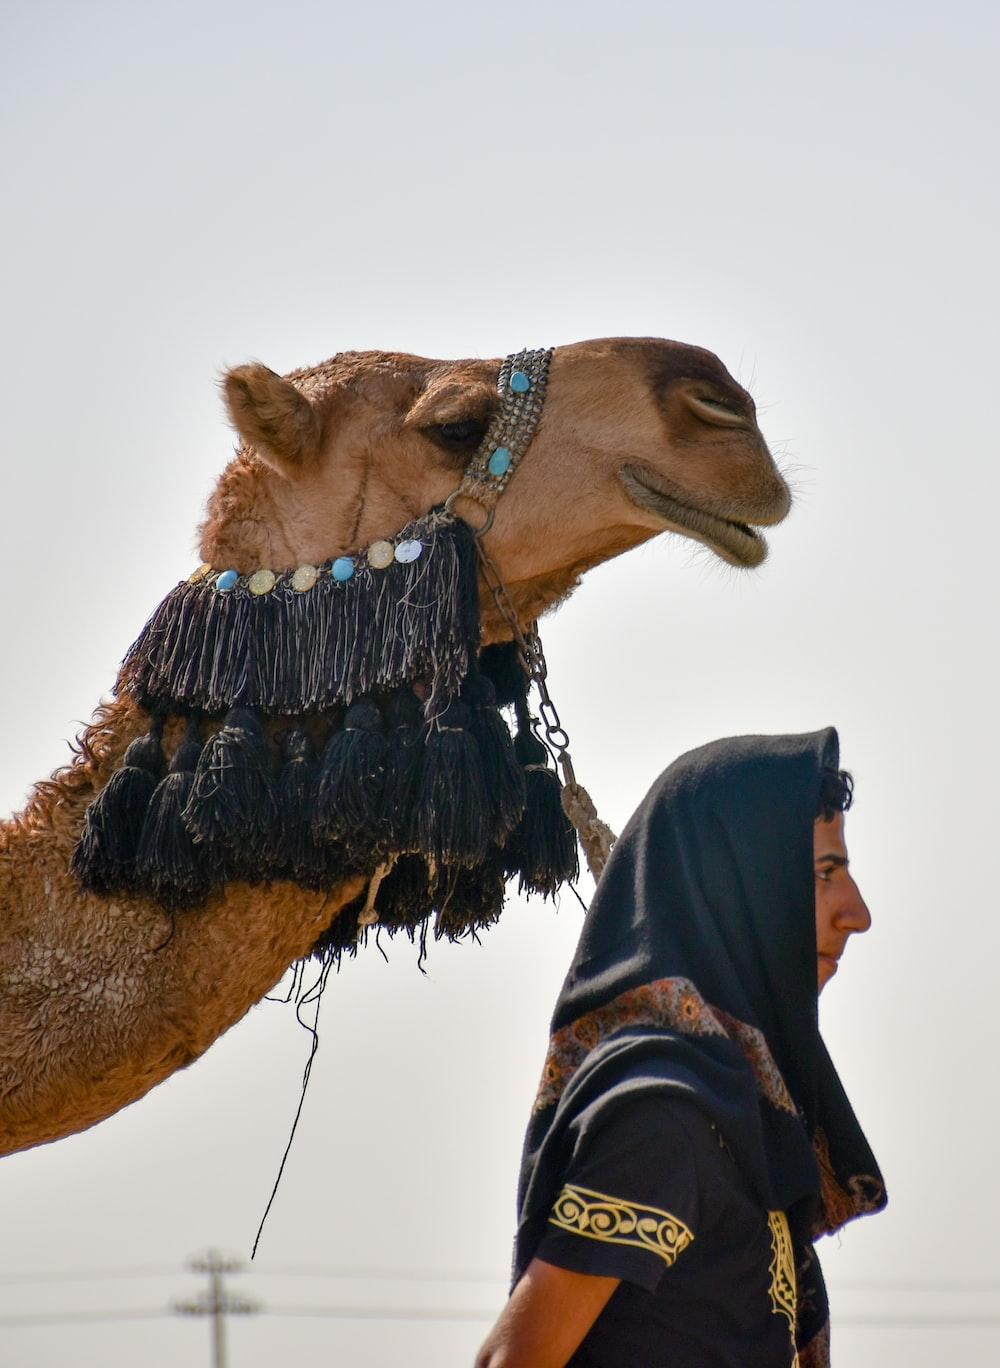 person in black jacket standing beside brown camel